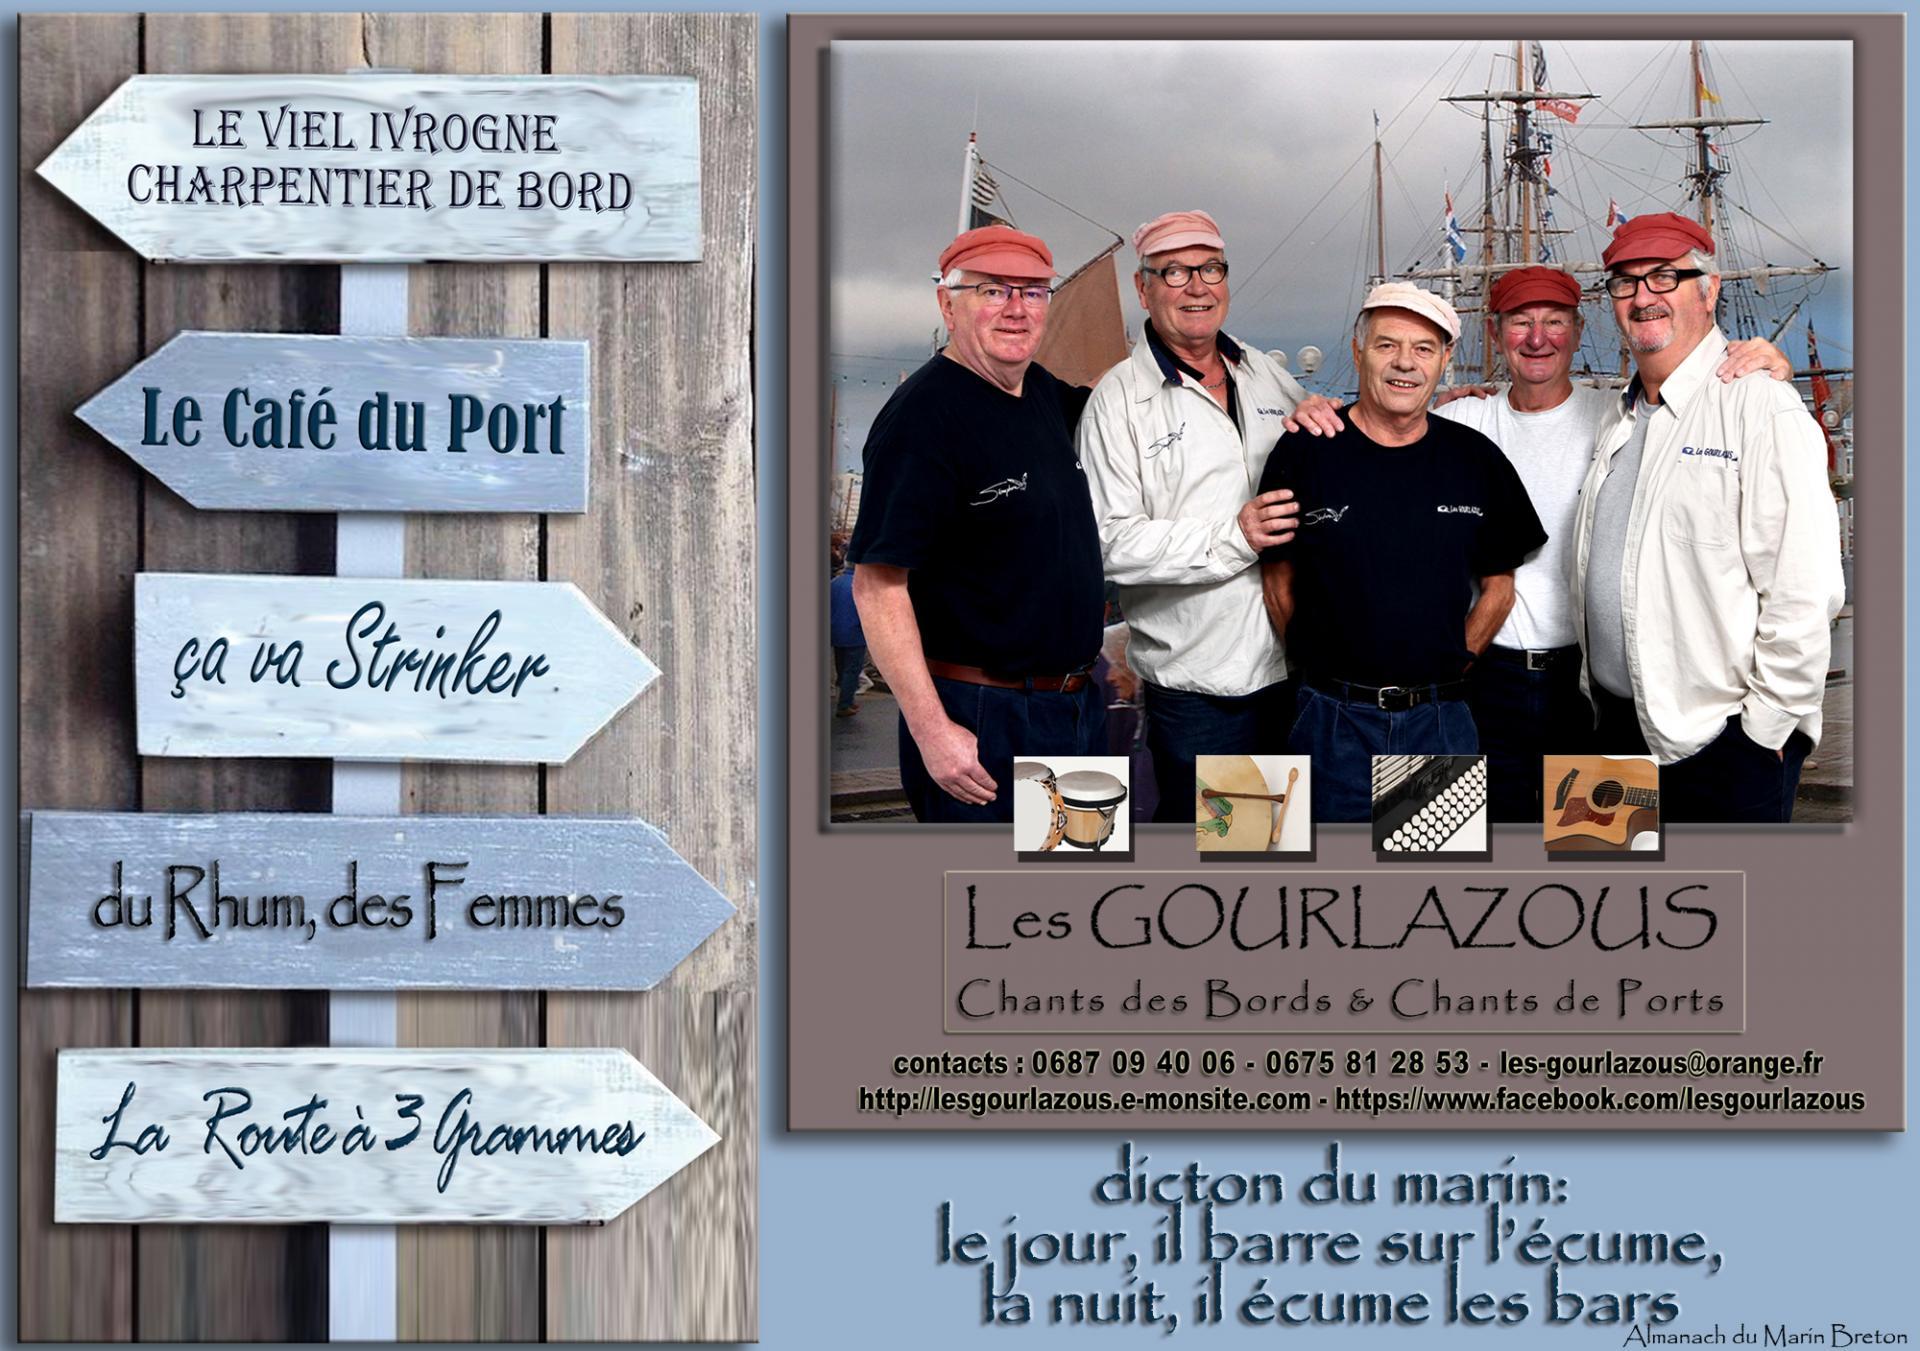 Almanach du marin breton dicton